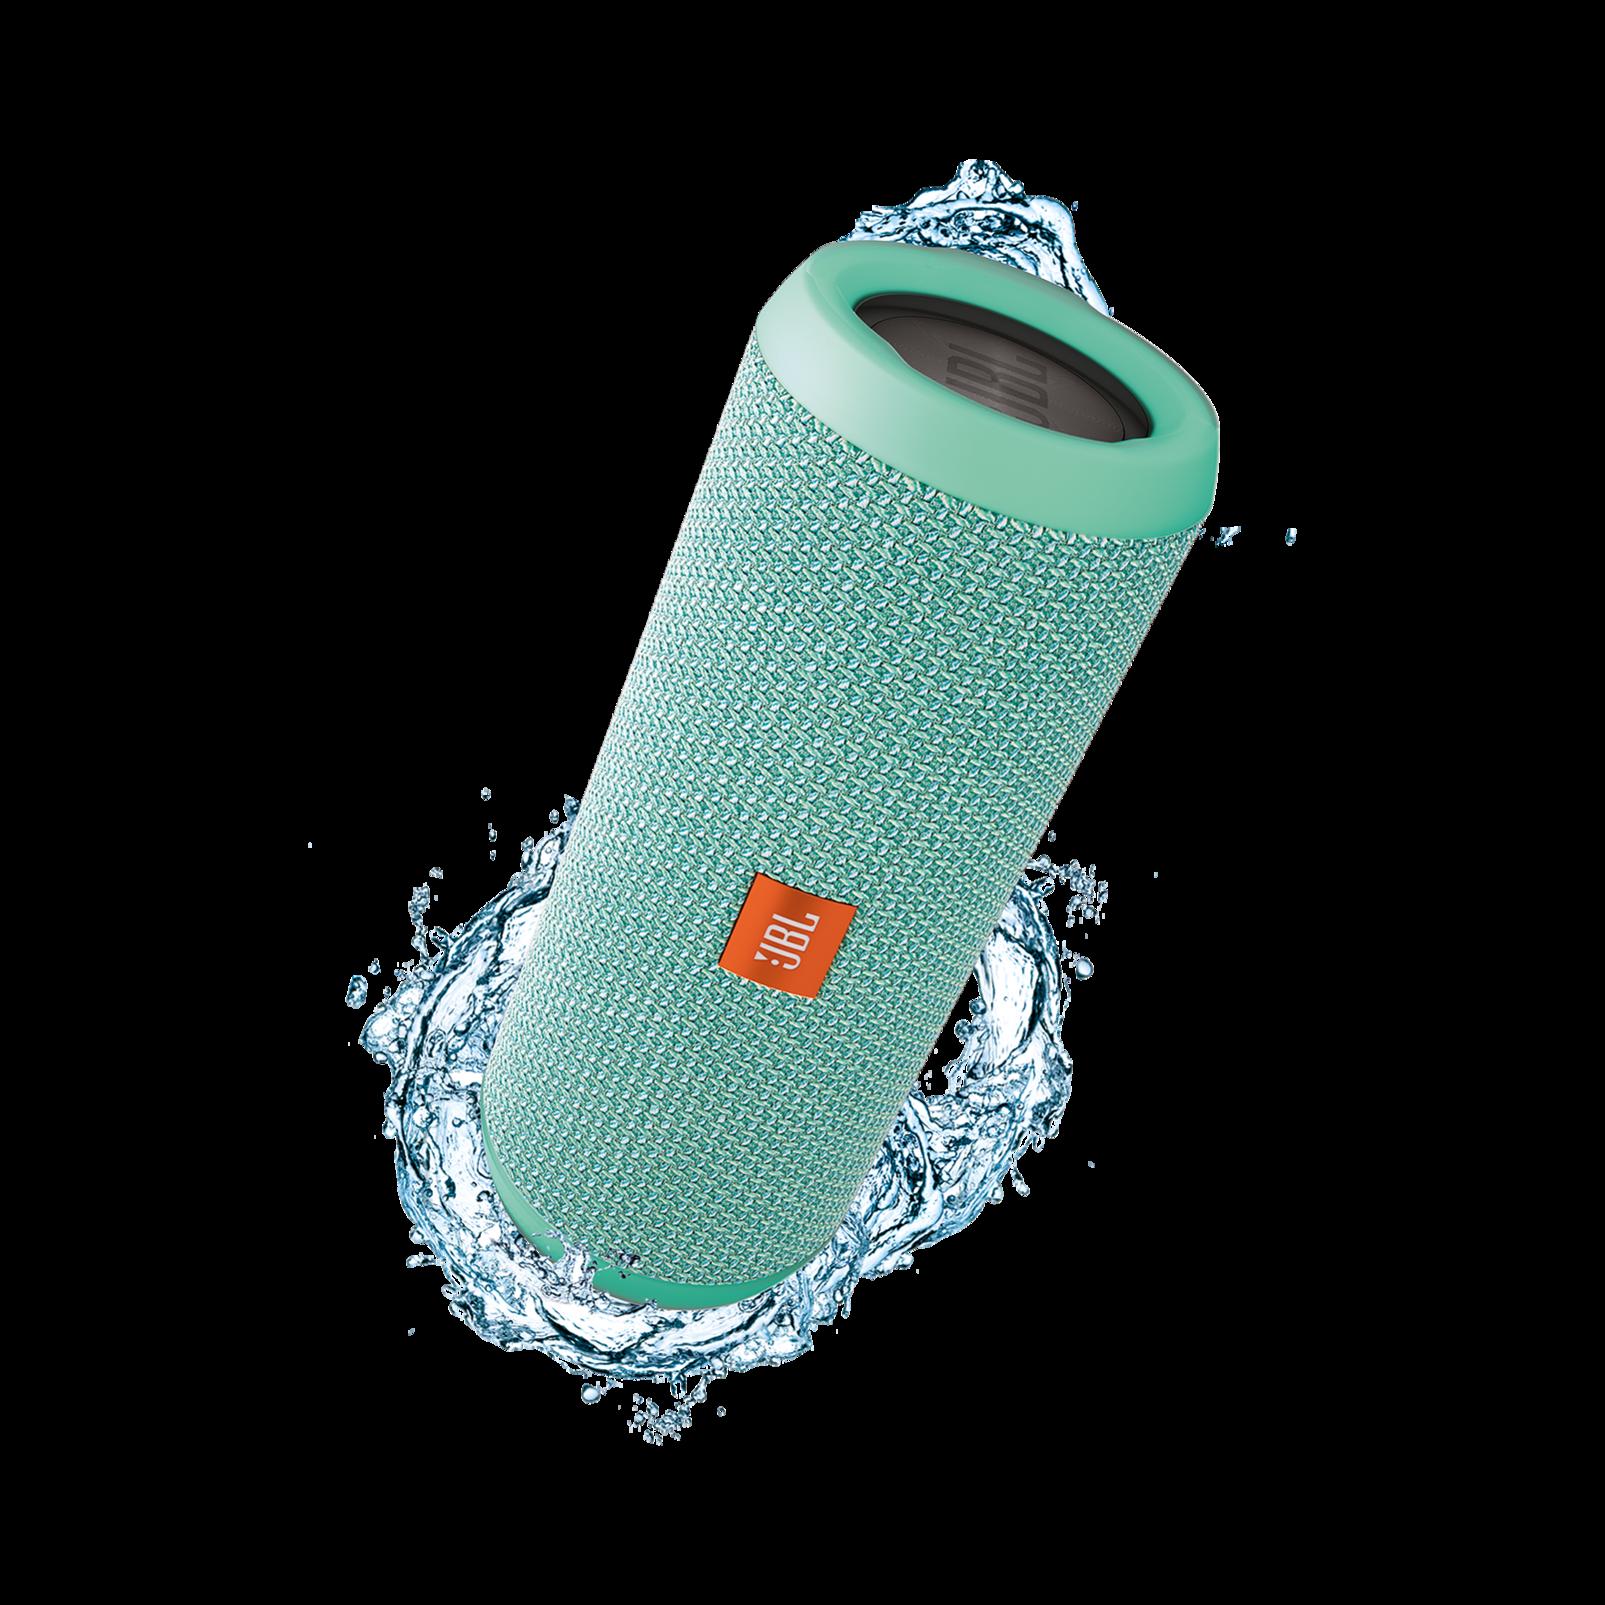 JBL Flip 3 - Teal - Splashproof portable Bluetooth speaker with powerful sound and speakerphone technology - Hero